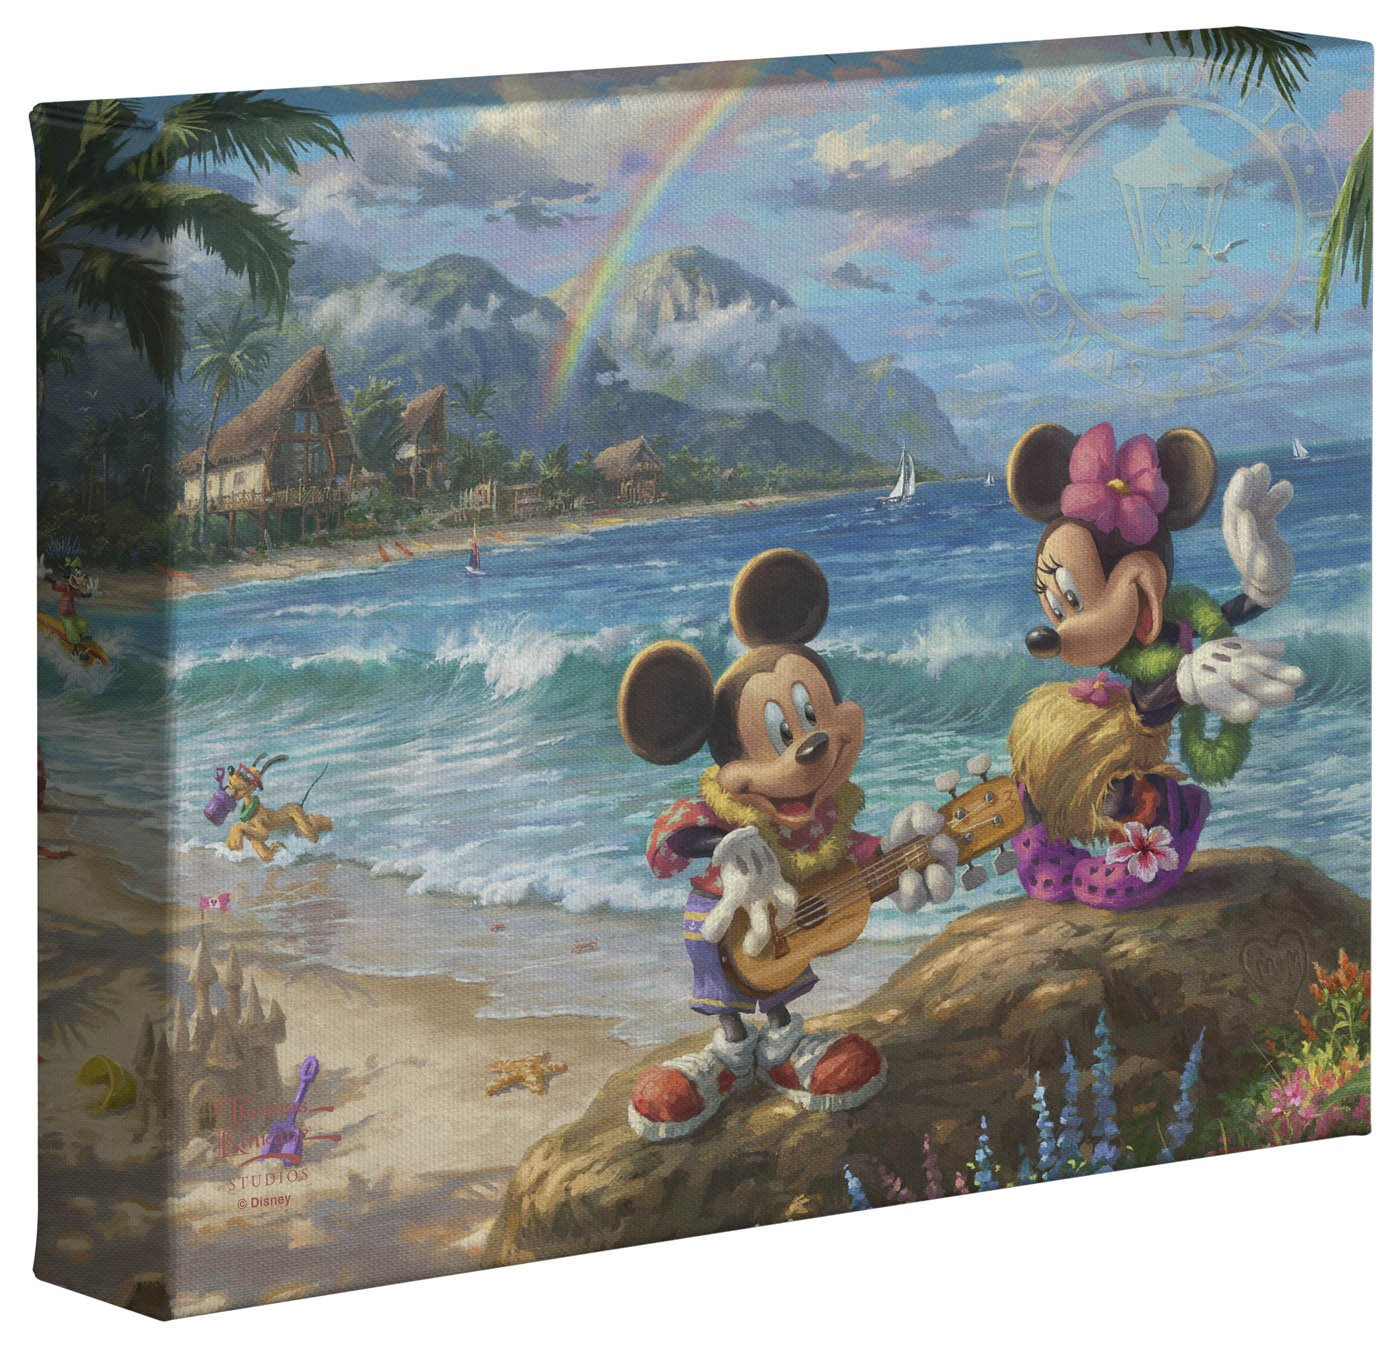 Thomas Kinkade Studios Disneys Mickey and Minnie in Hawaii 8 x 10 Gallery Wrapped Canvas 87959